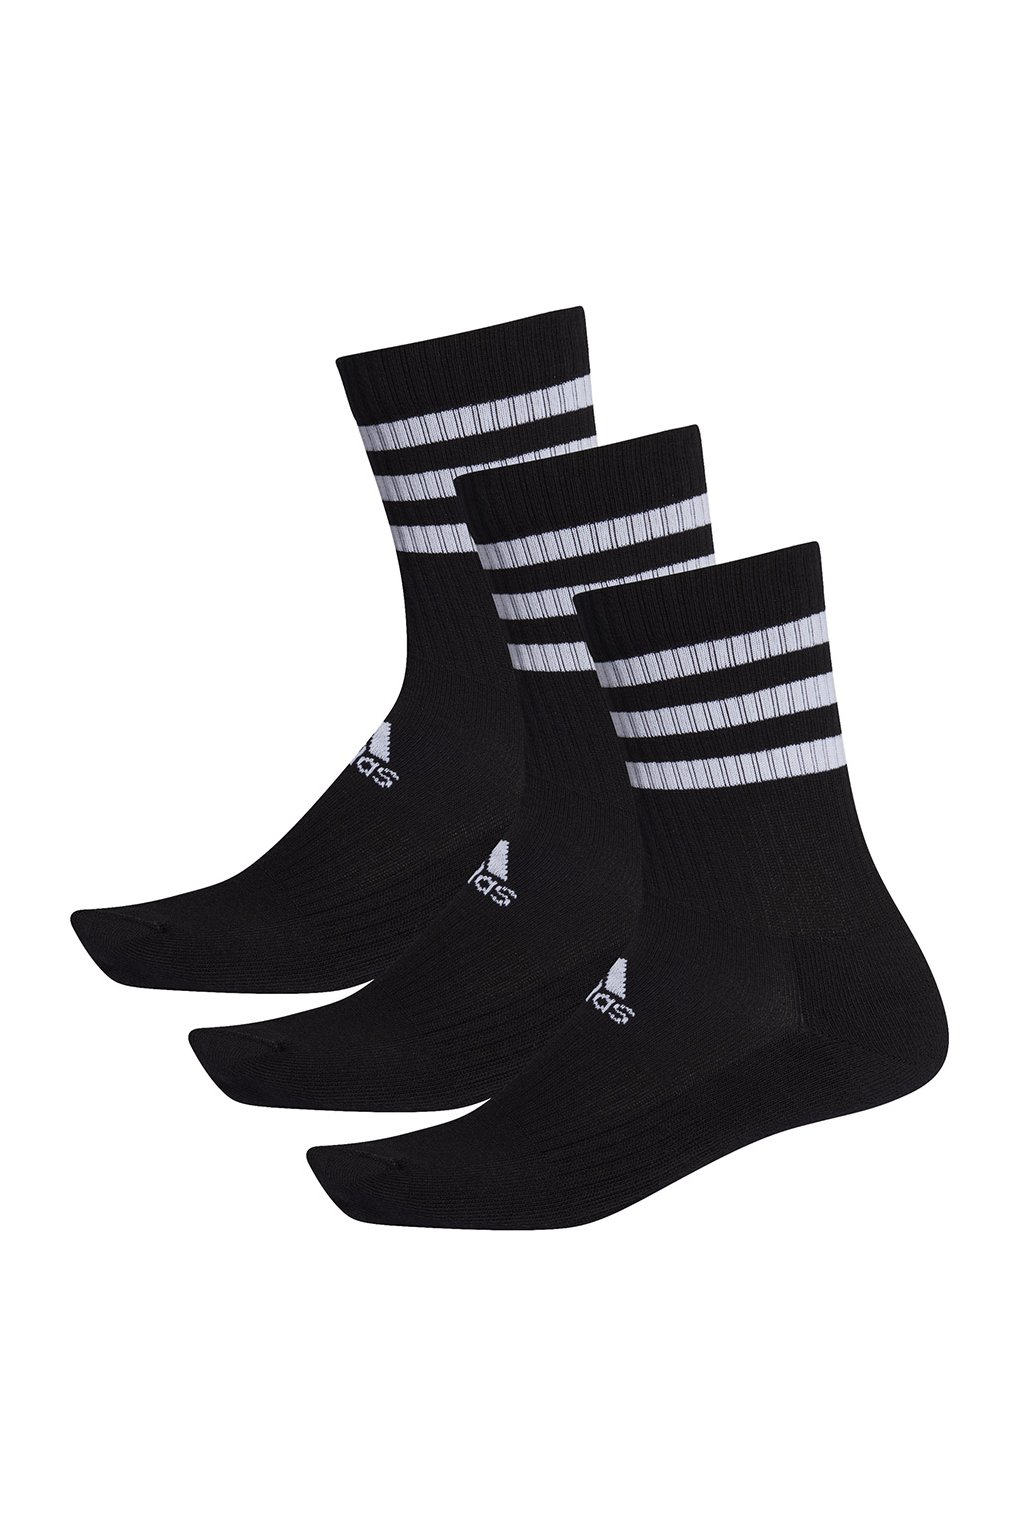 Ponožky Adidas 3S CSH CRW 3 páry čierne DZ9347